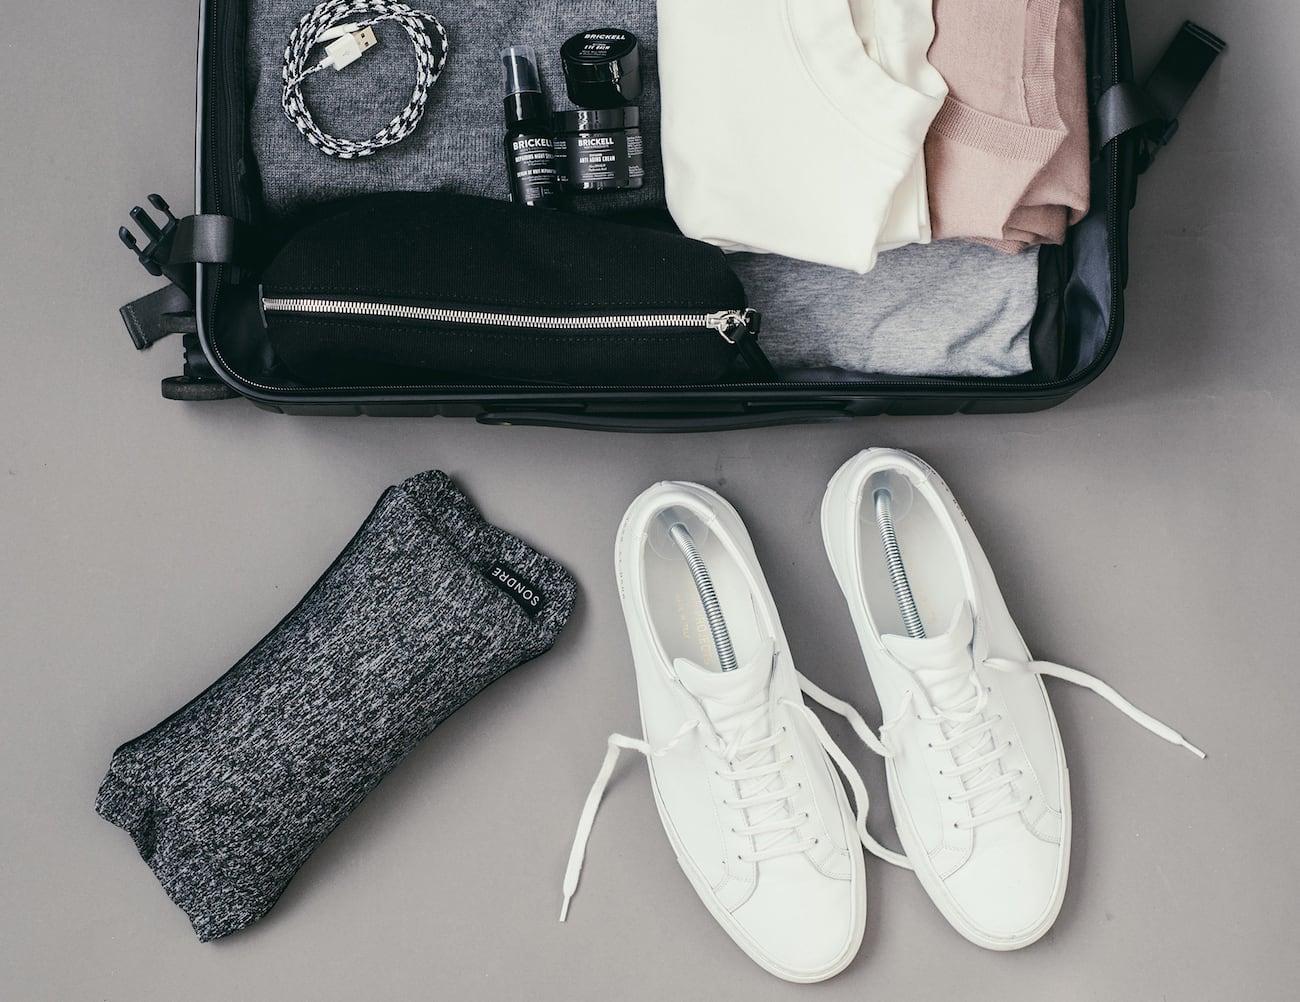 Sondre Travel Voyage Compact Travel Pillow